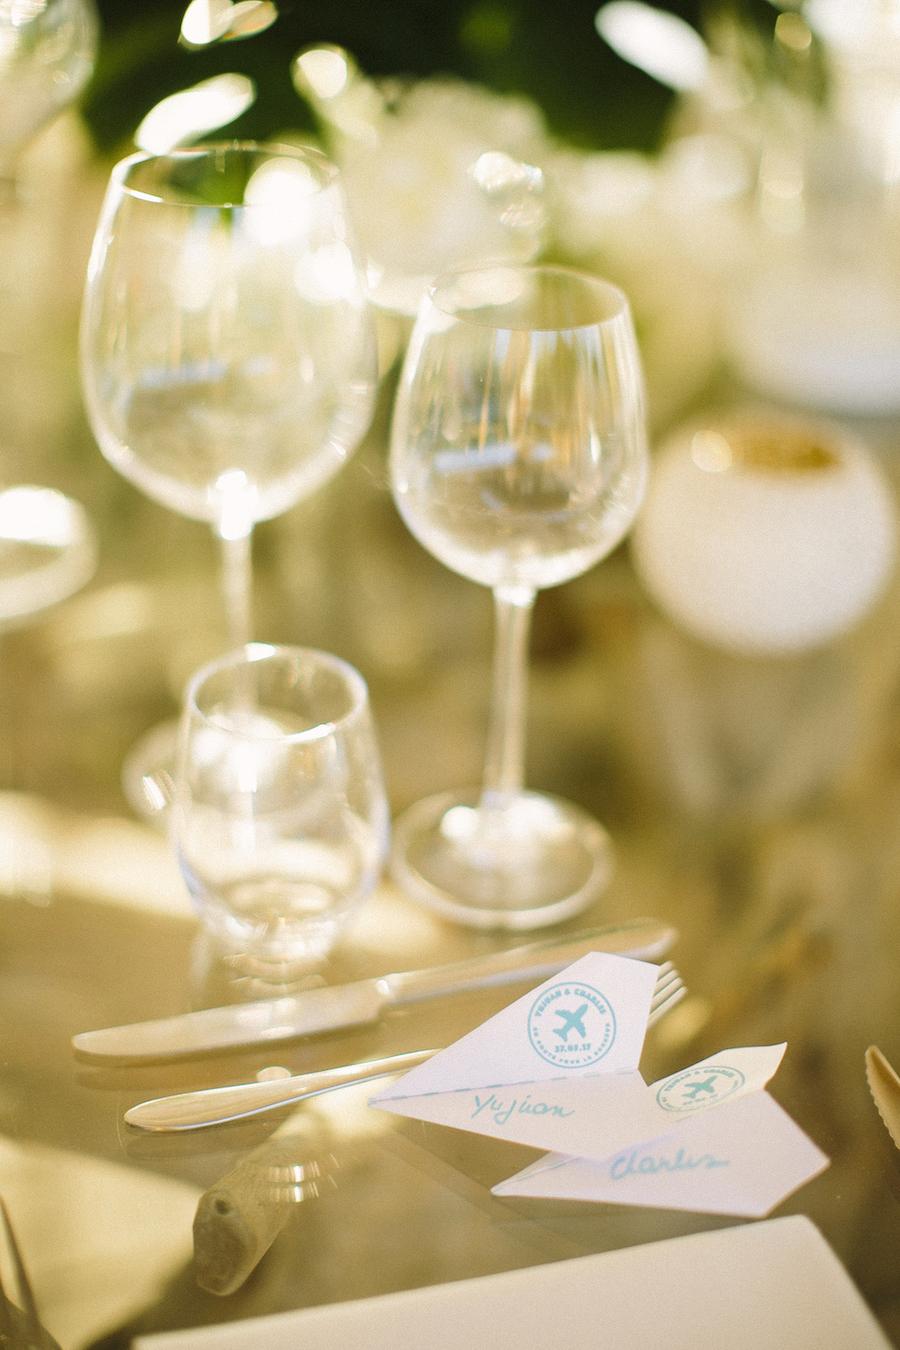 saya-photography-wedding-mariage-corse-corsica140.jpg